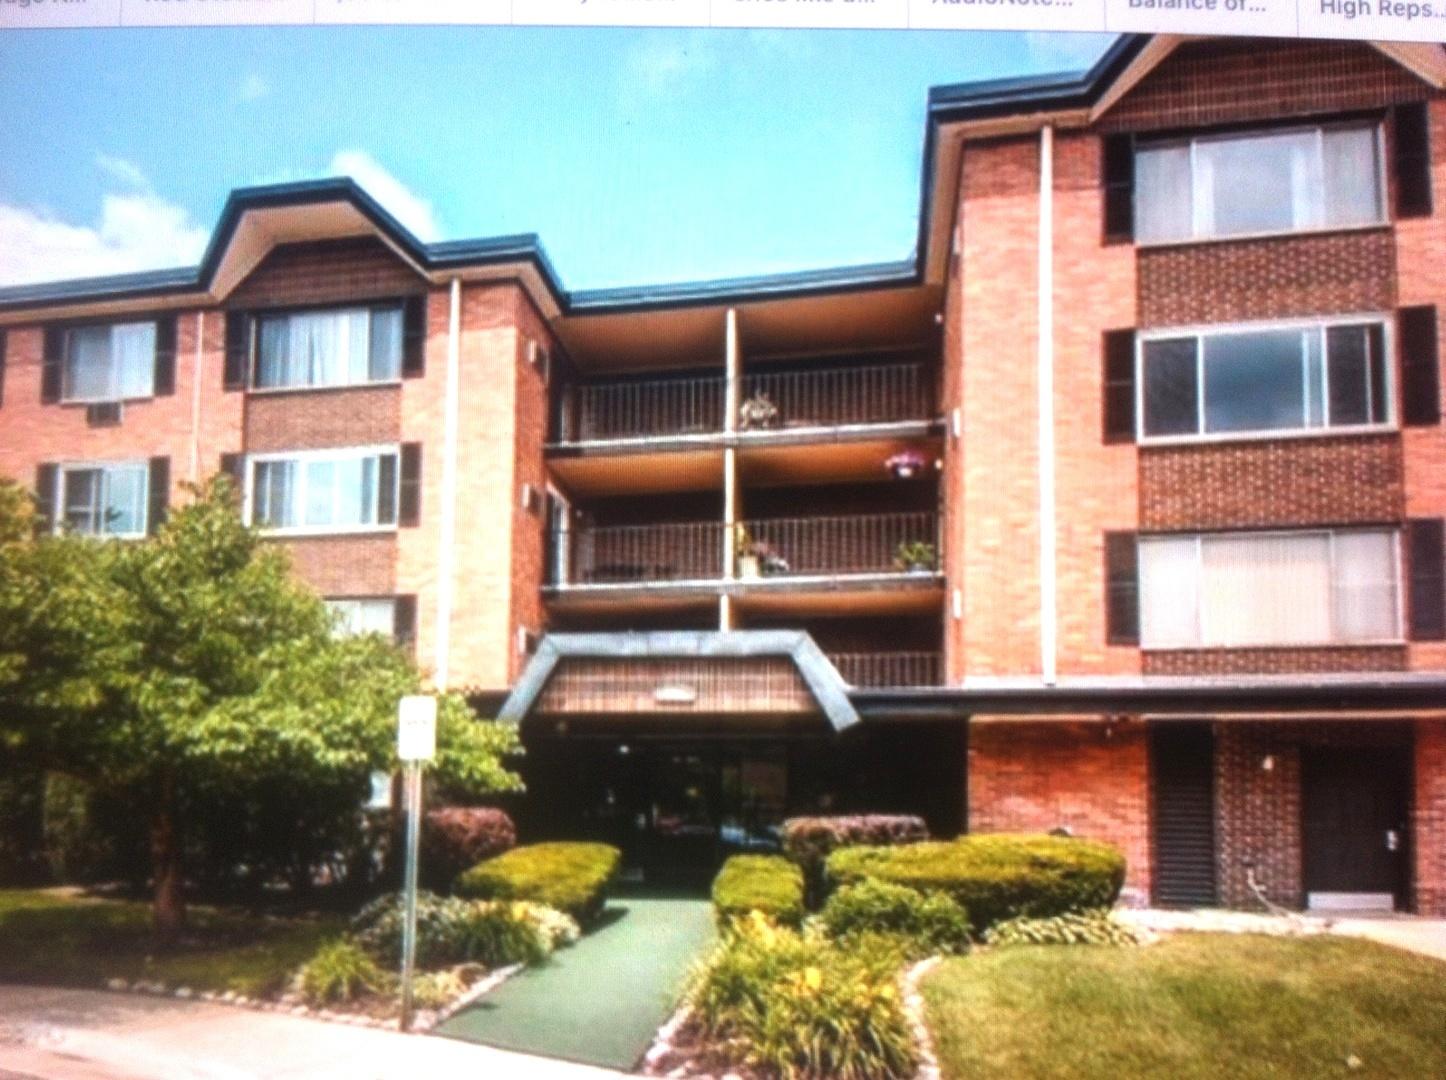 $137,000 - 2Br/2Ba -  for Sale in Mallard Cove, Arlington Heights